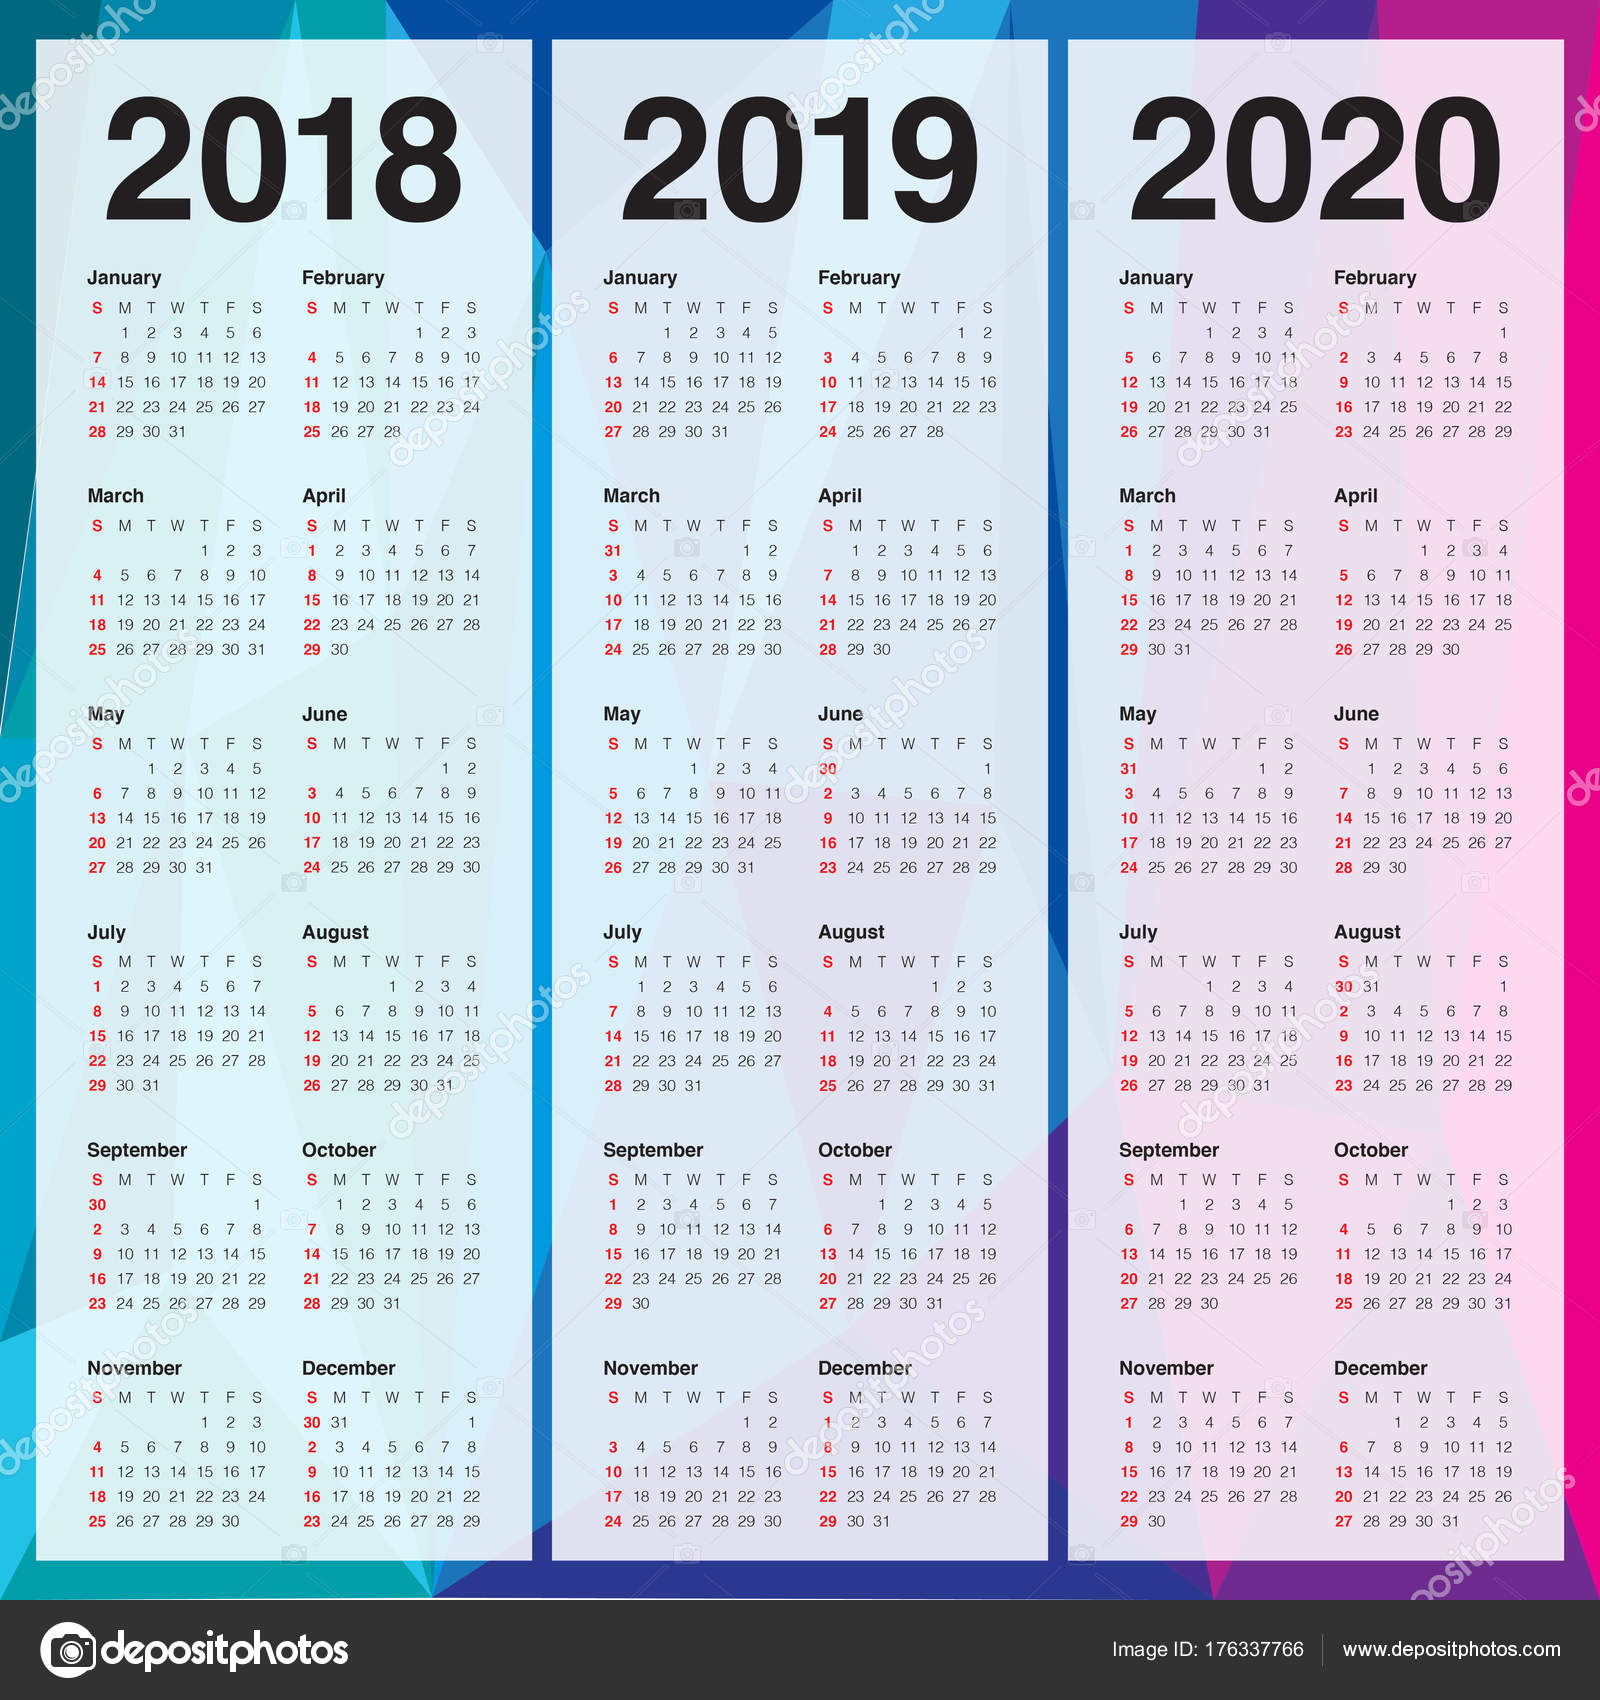 Year 2018 2019 2020 Calendar Vector Stock Vector C Dolphfynlow